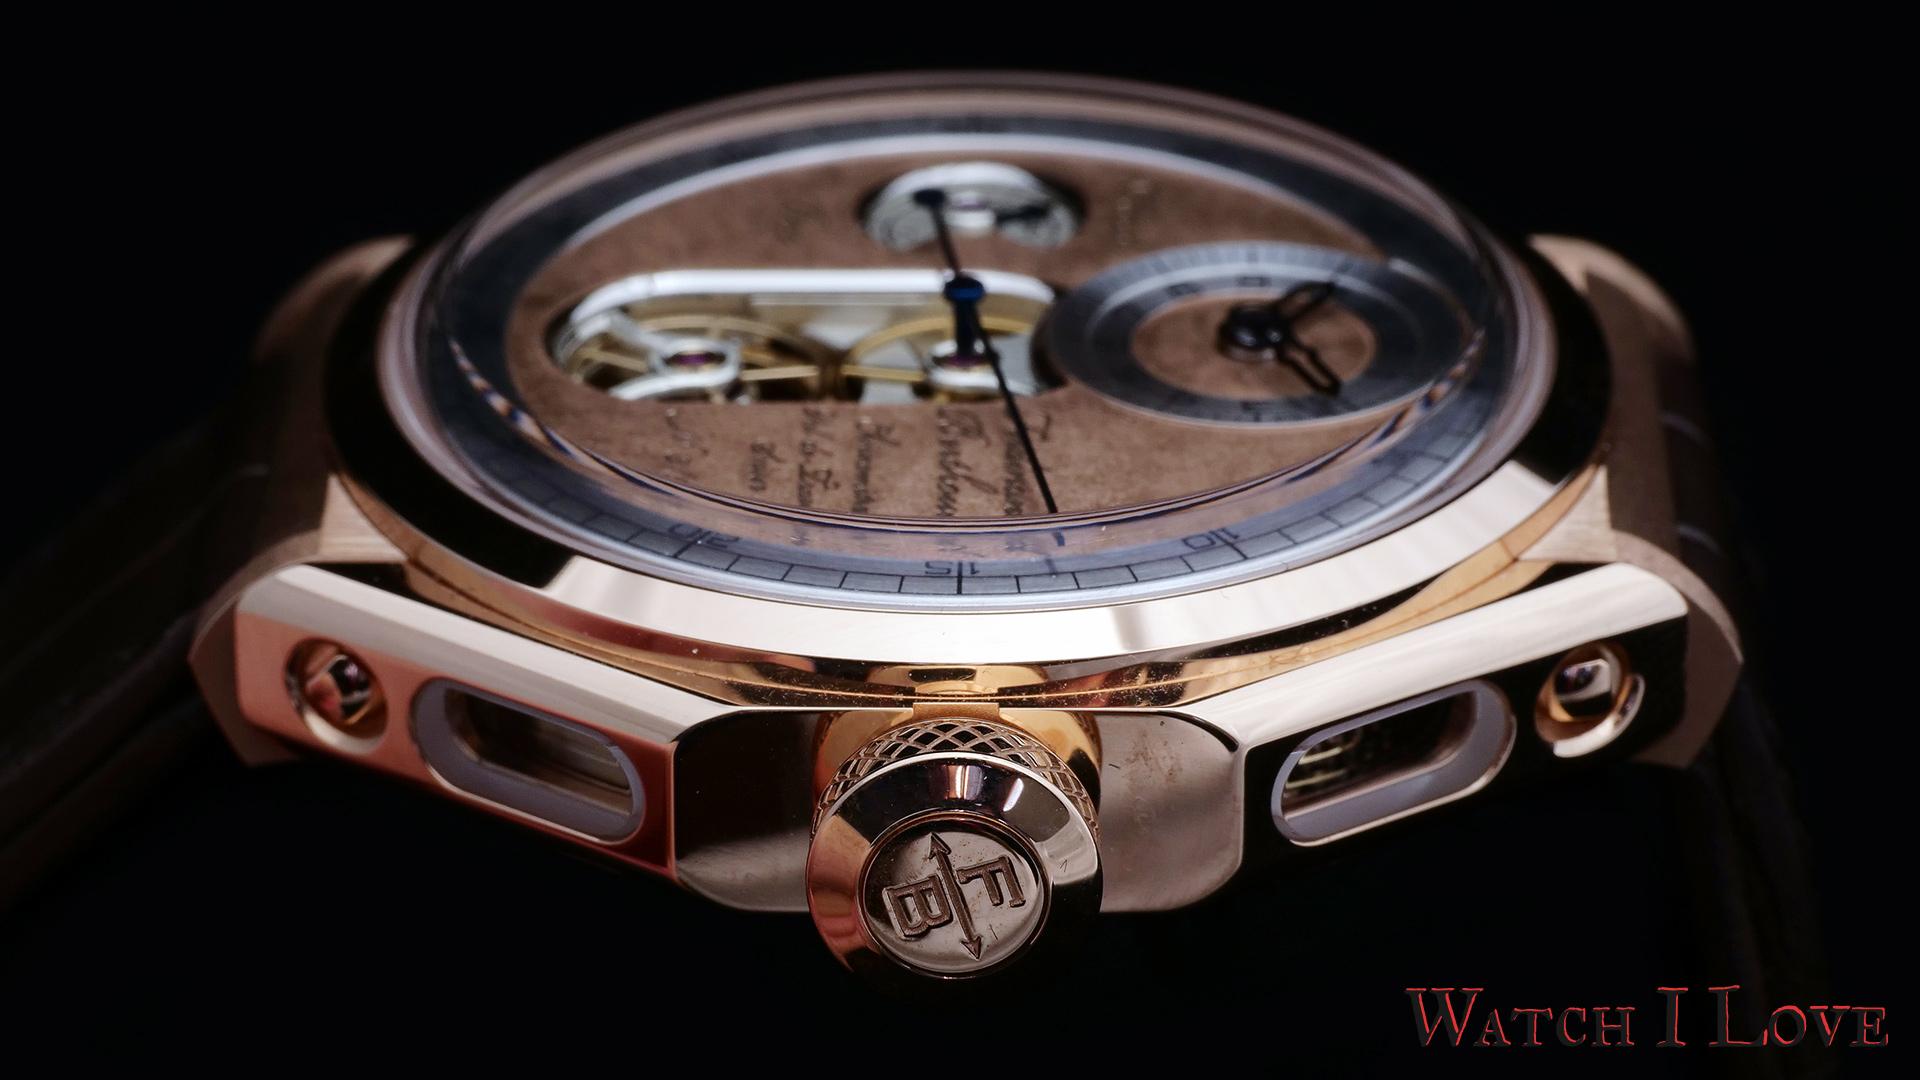 Ferdinand Berthoud Ref. FB 1.2-1 case side with crown